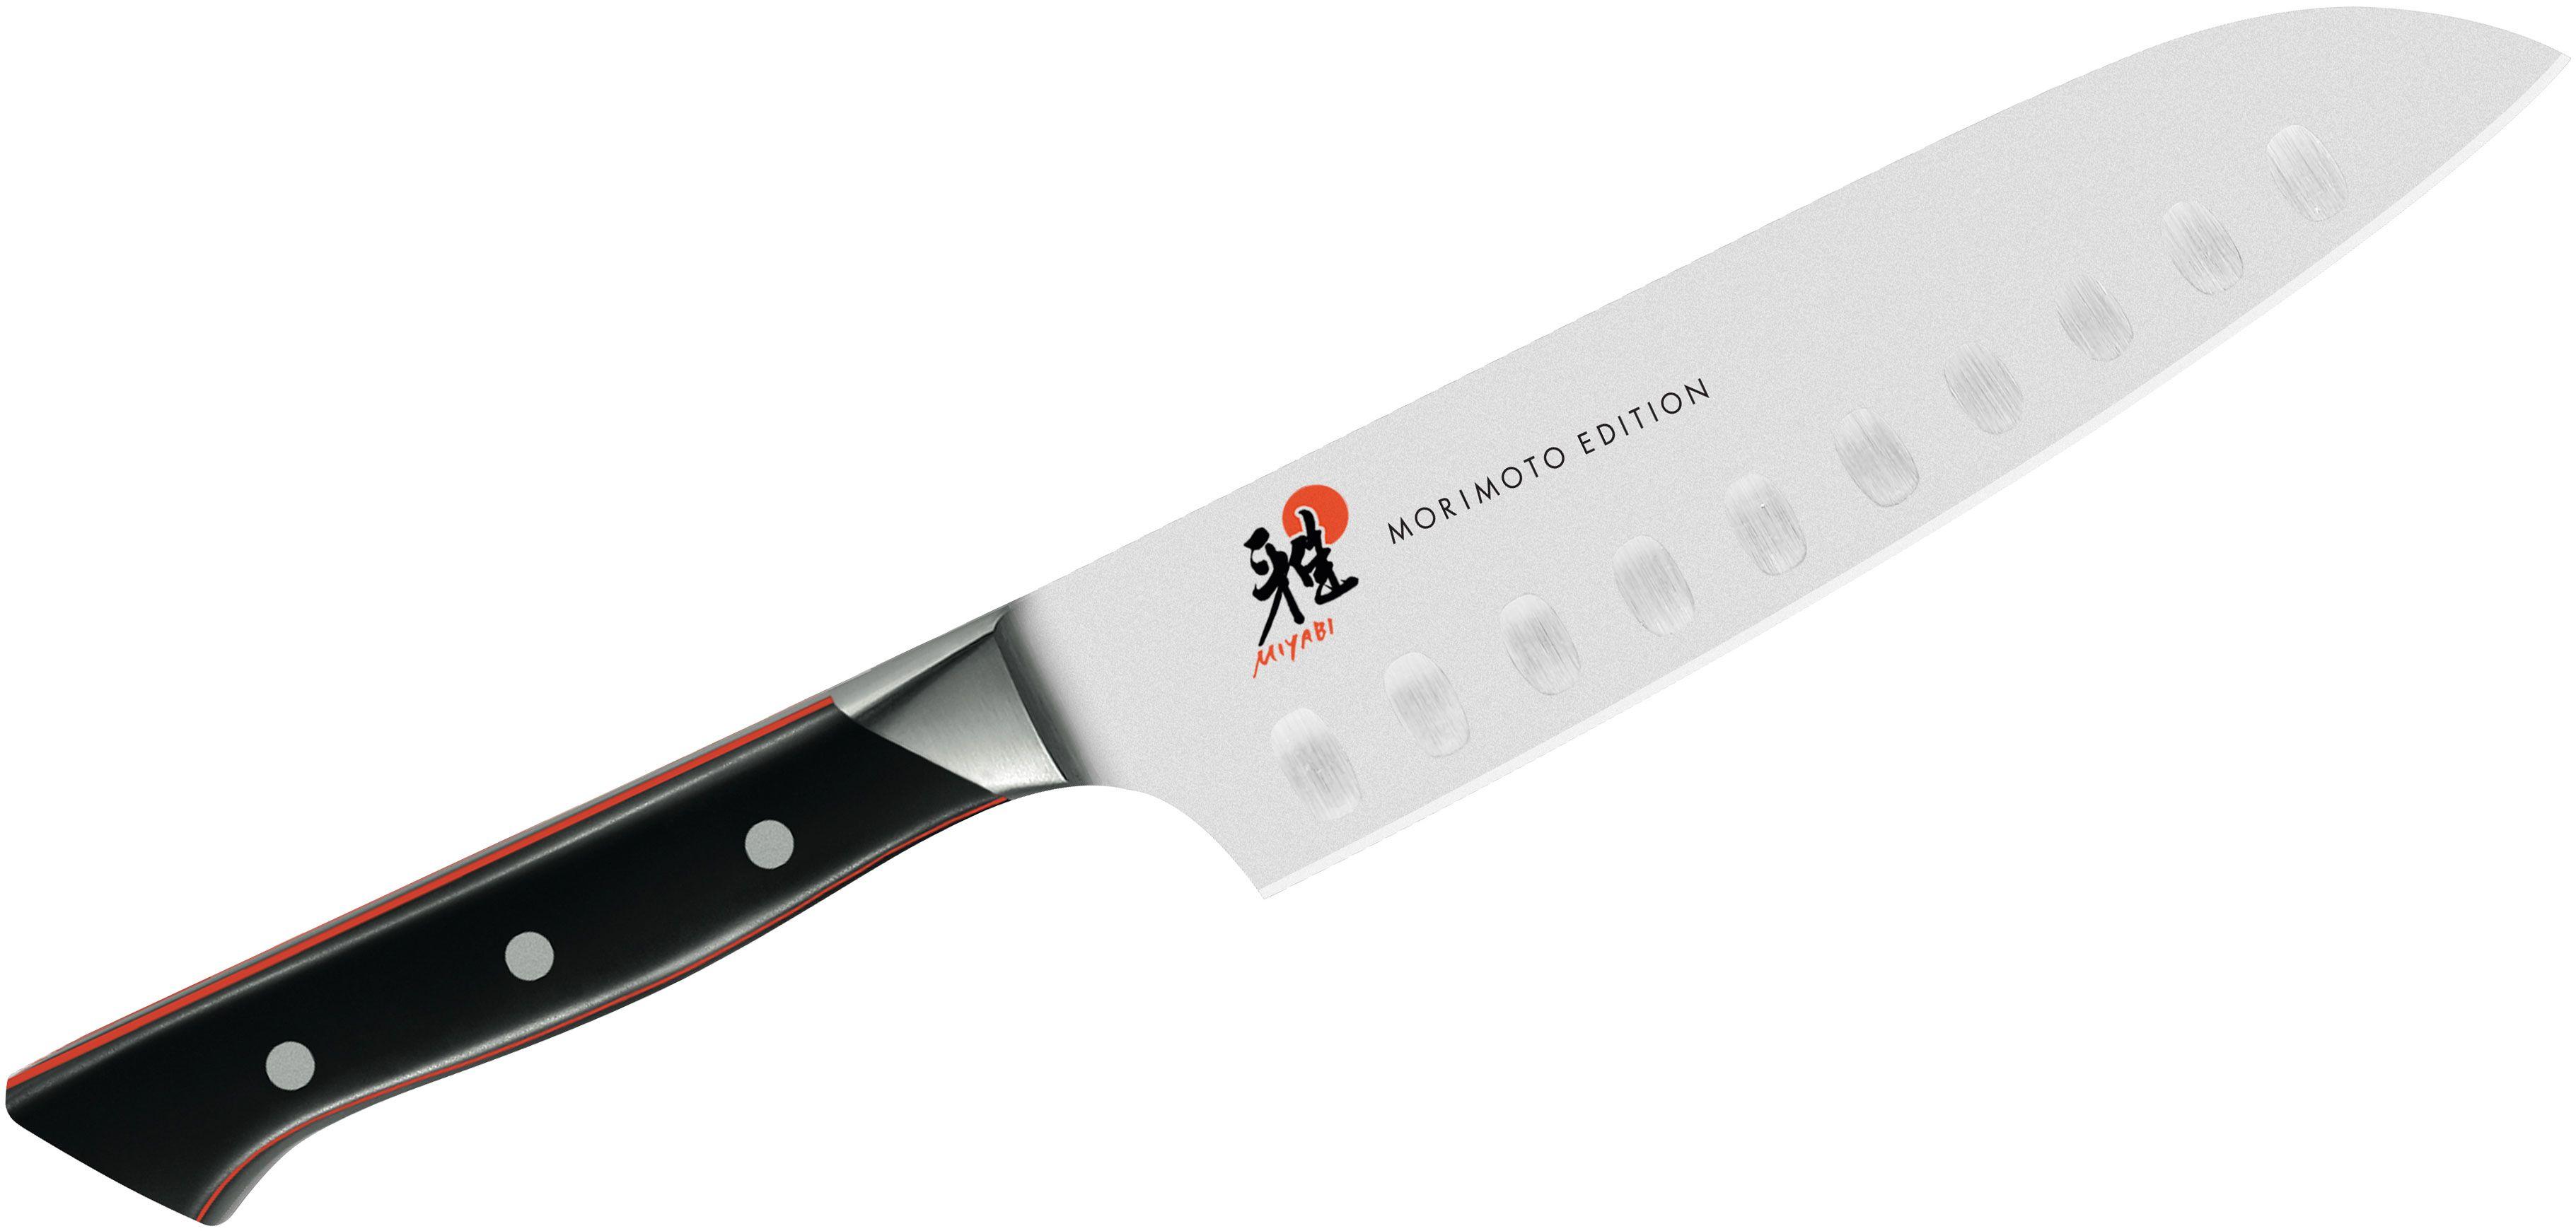 Zwilling J.A. Henckels Miyabi Red 600S Morimoto 7 inch Santoku Knife